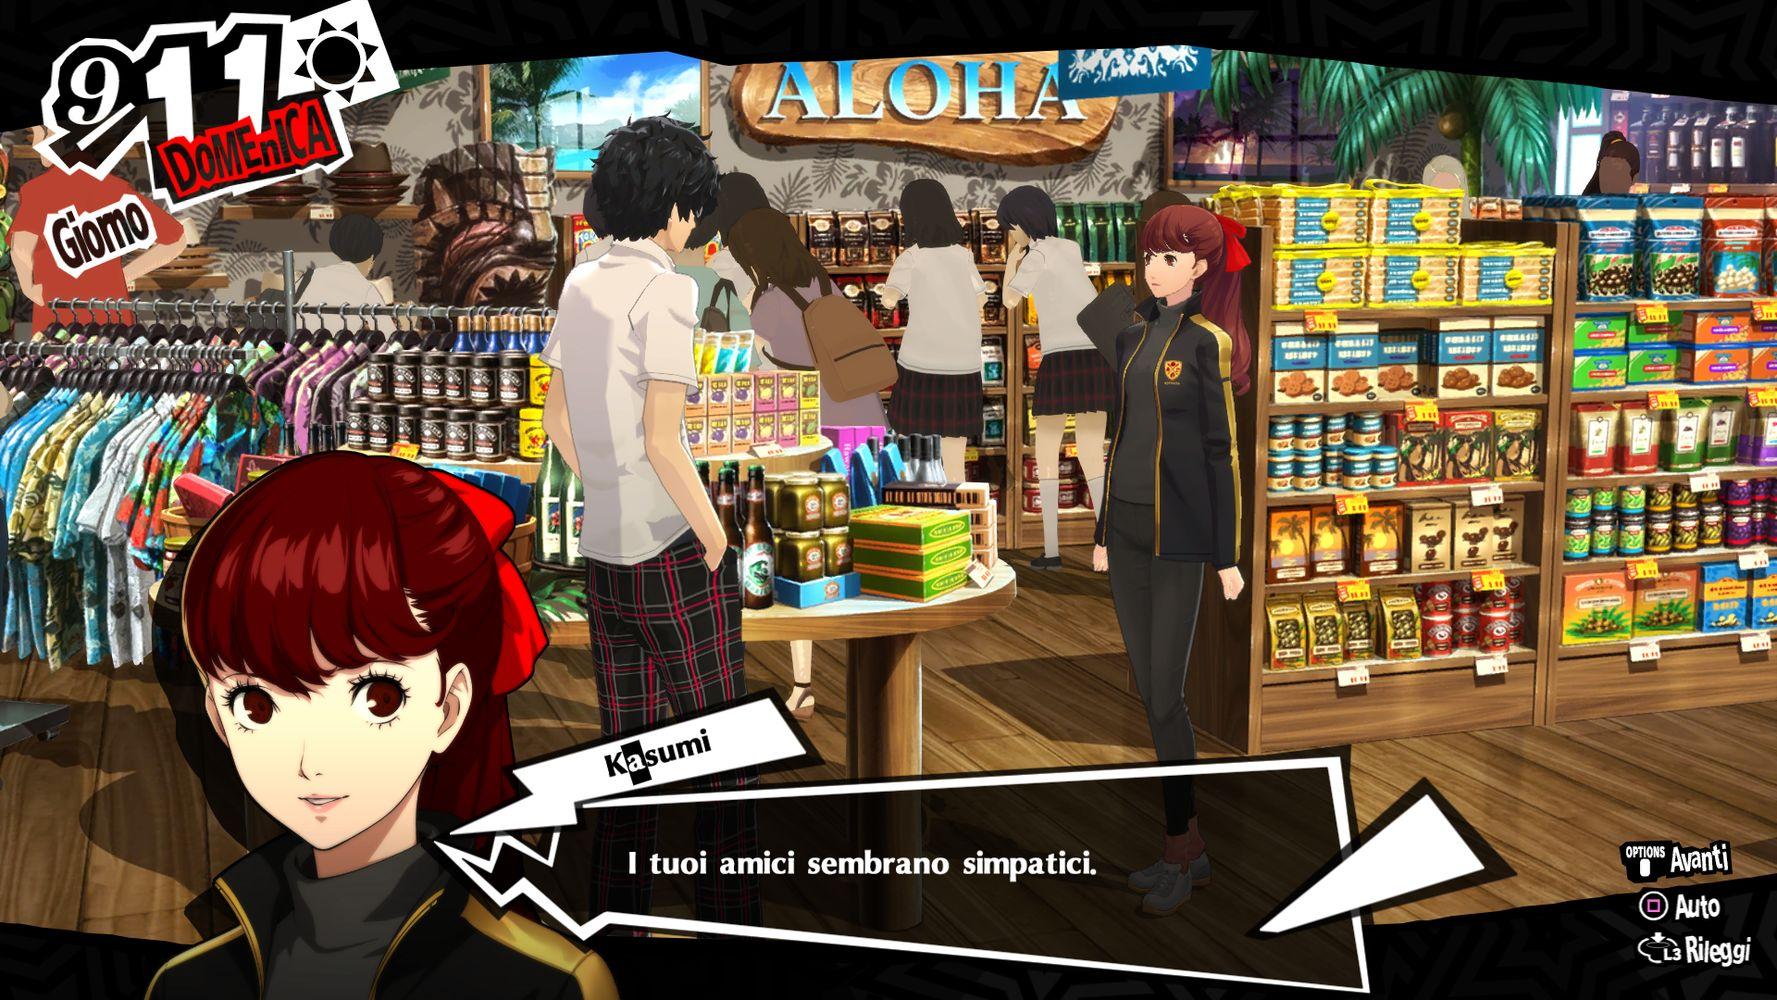 Kasumi e Ren, Persona 5 Royal